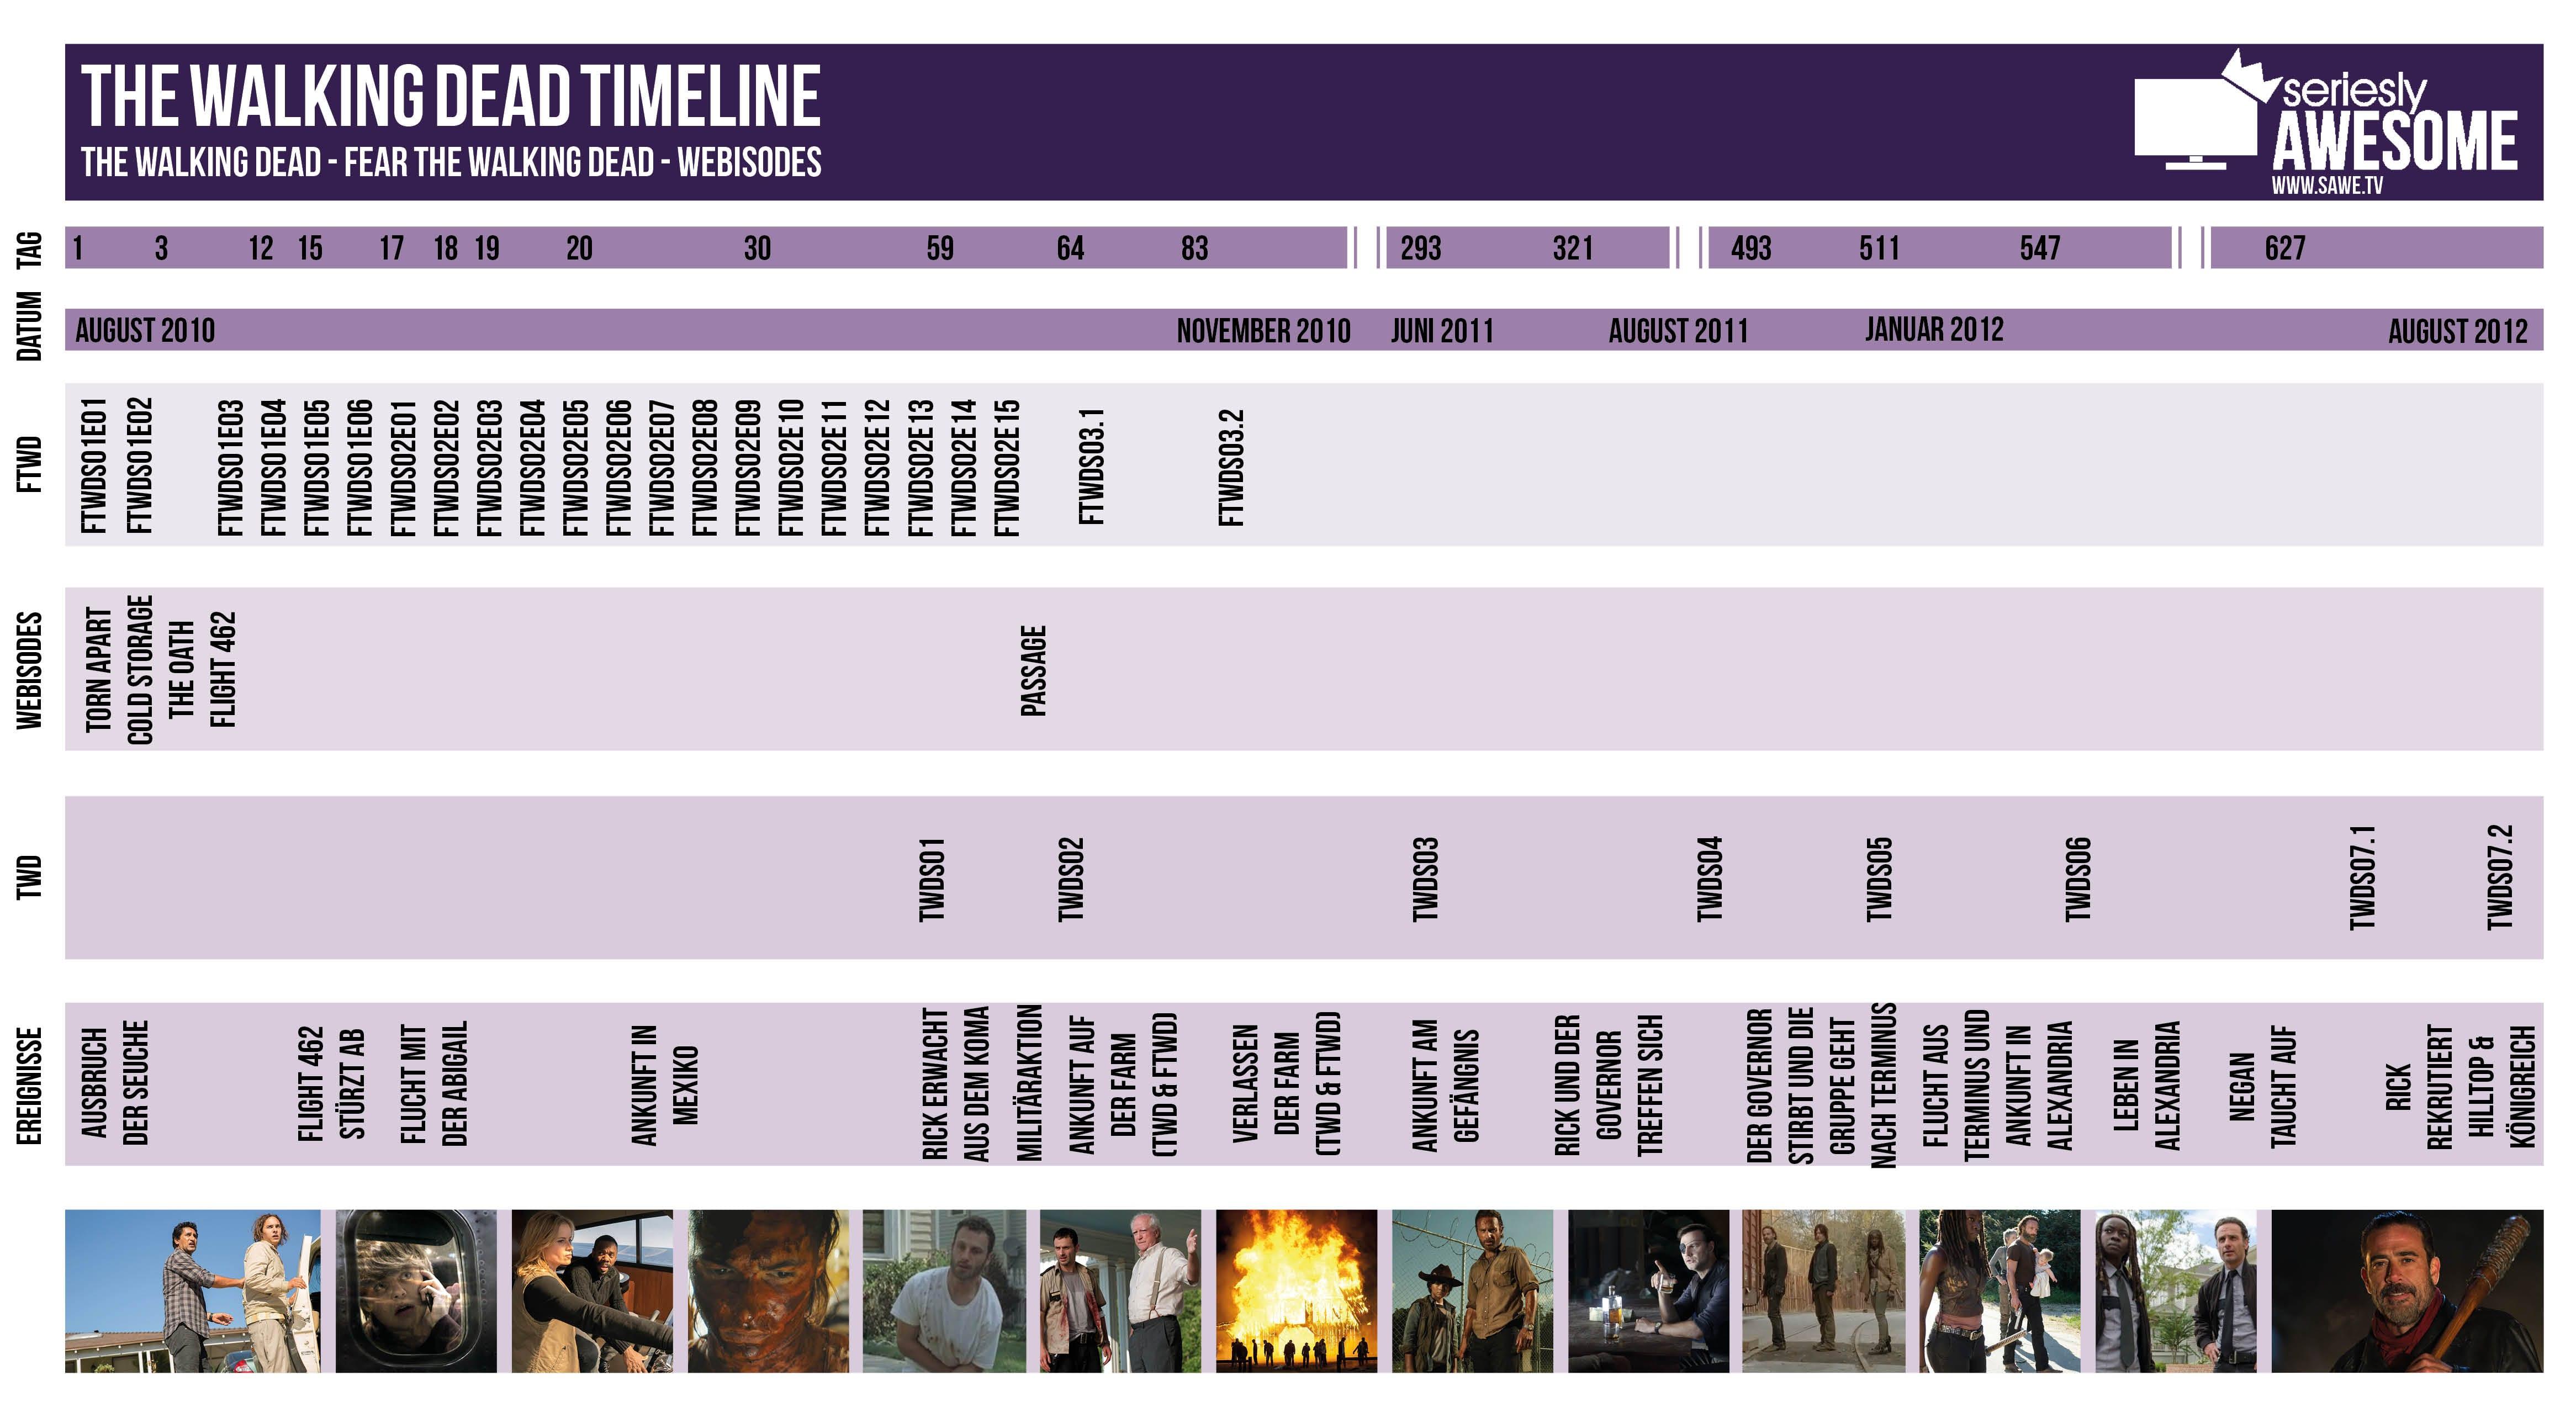 TWDFTWD Timeline